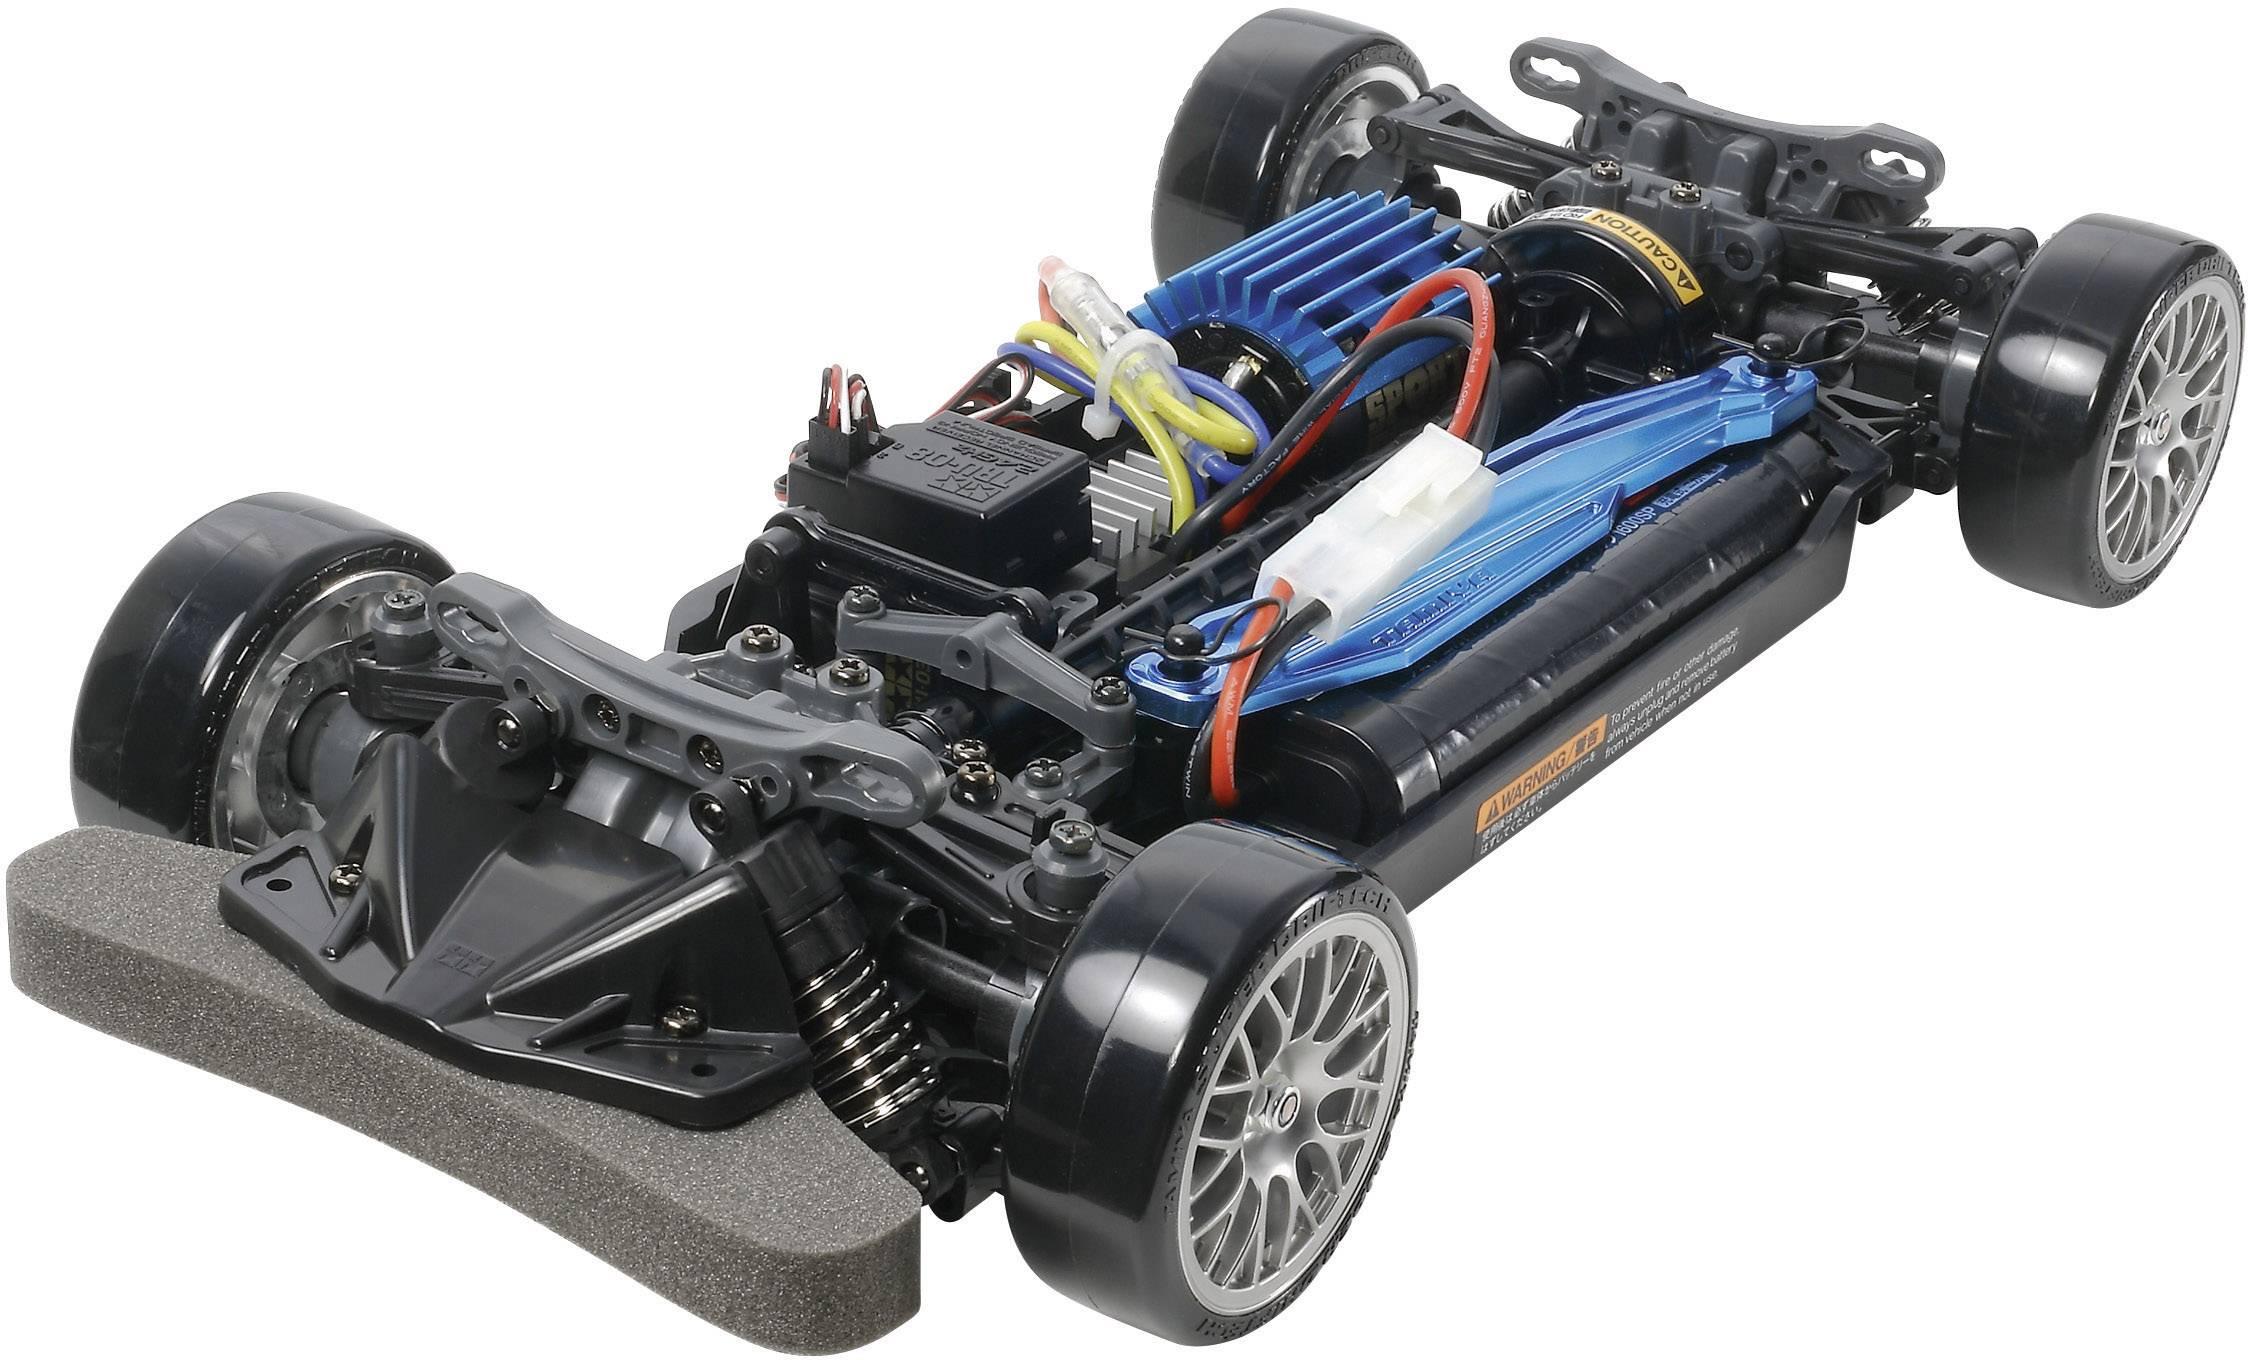 Tamiya Tt 02d Drift Spec Chassis Brushed 1 10 Rc Model Car Electric Road Version 4wd Kit Conrad Com